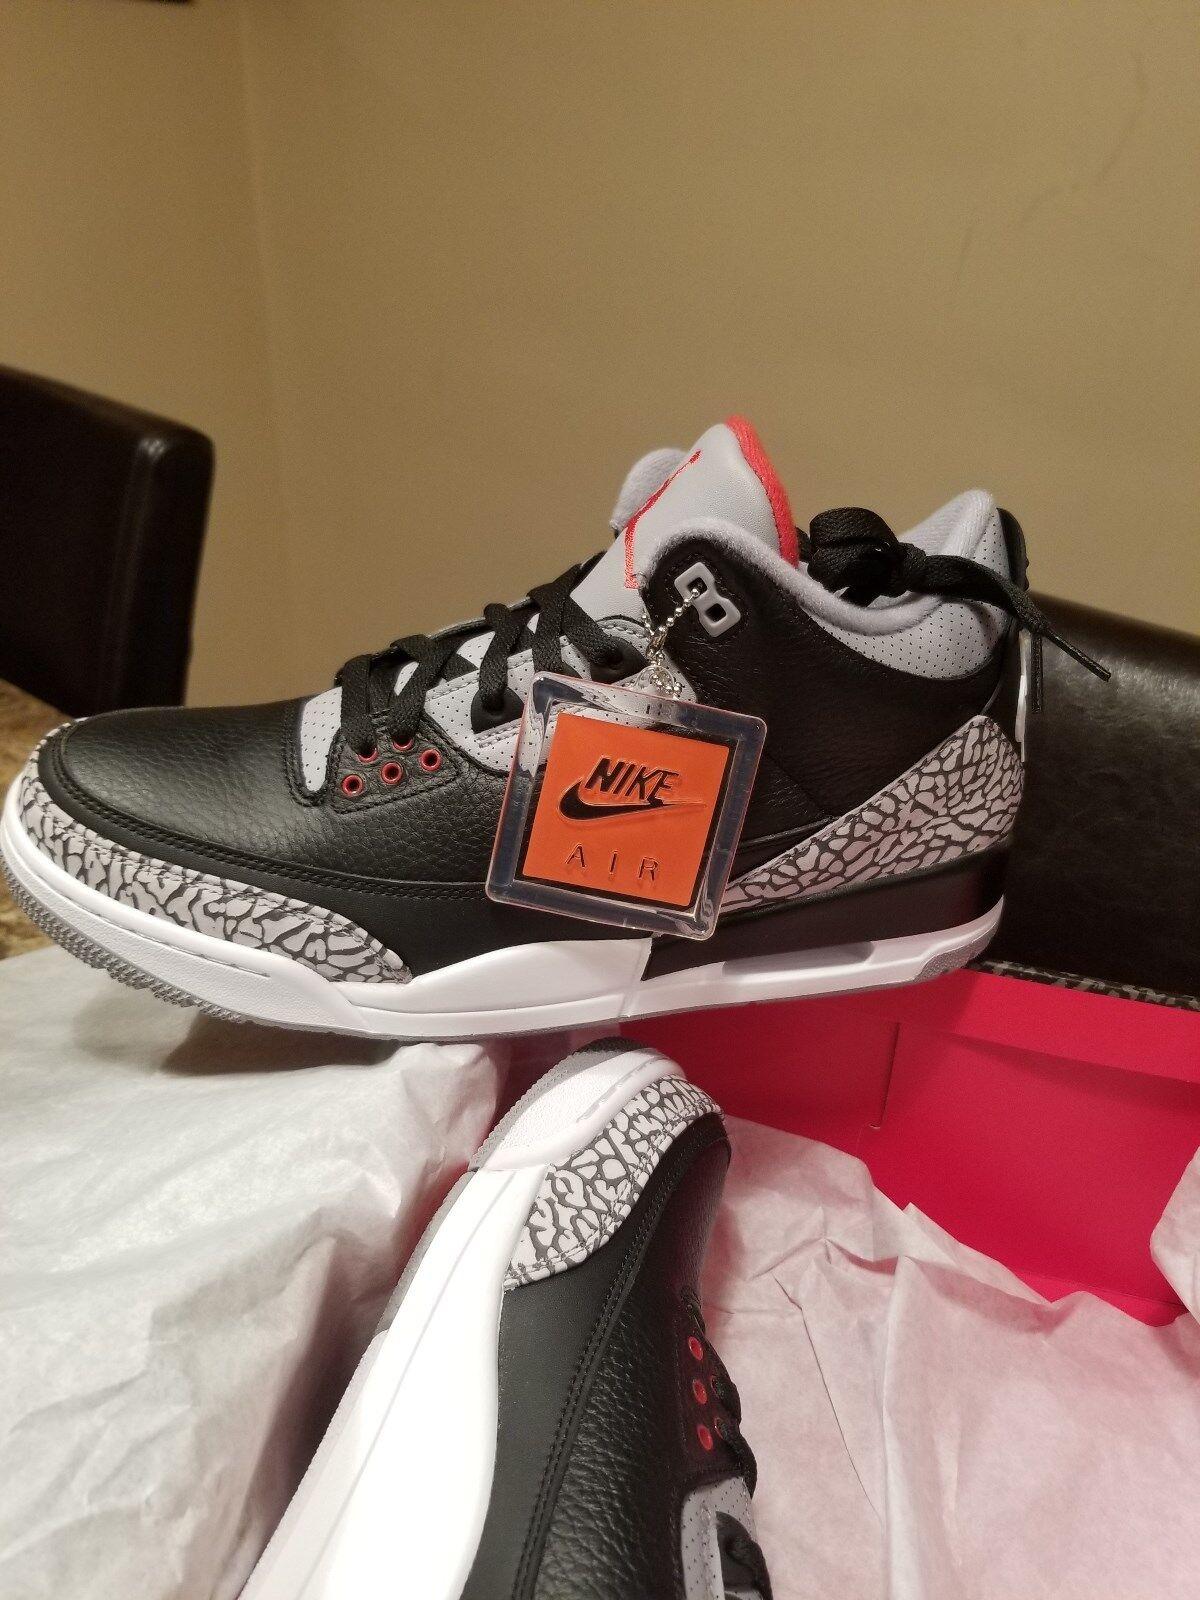 2018 Nike Air Jordan Retro 3 III Black Cement DS In Hand Size 11